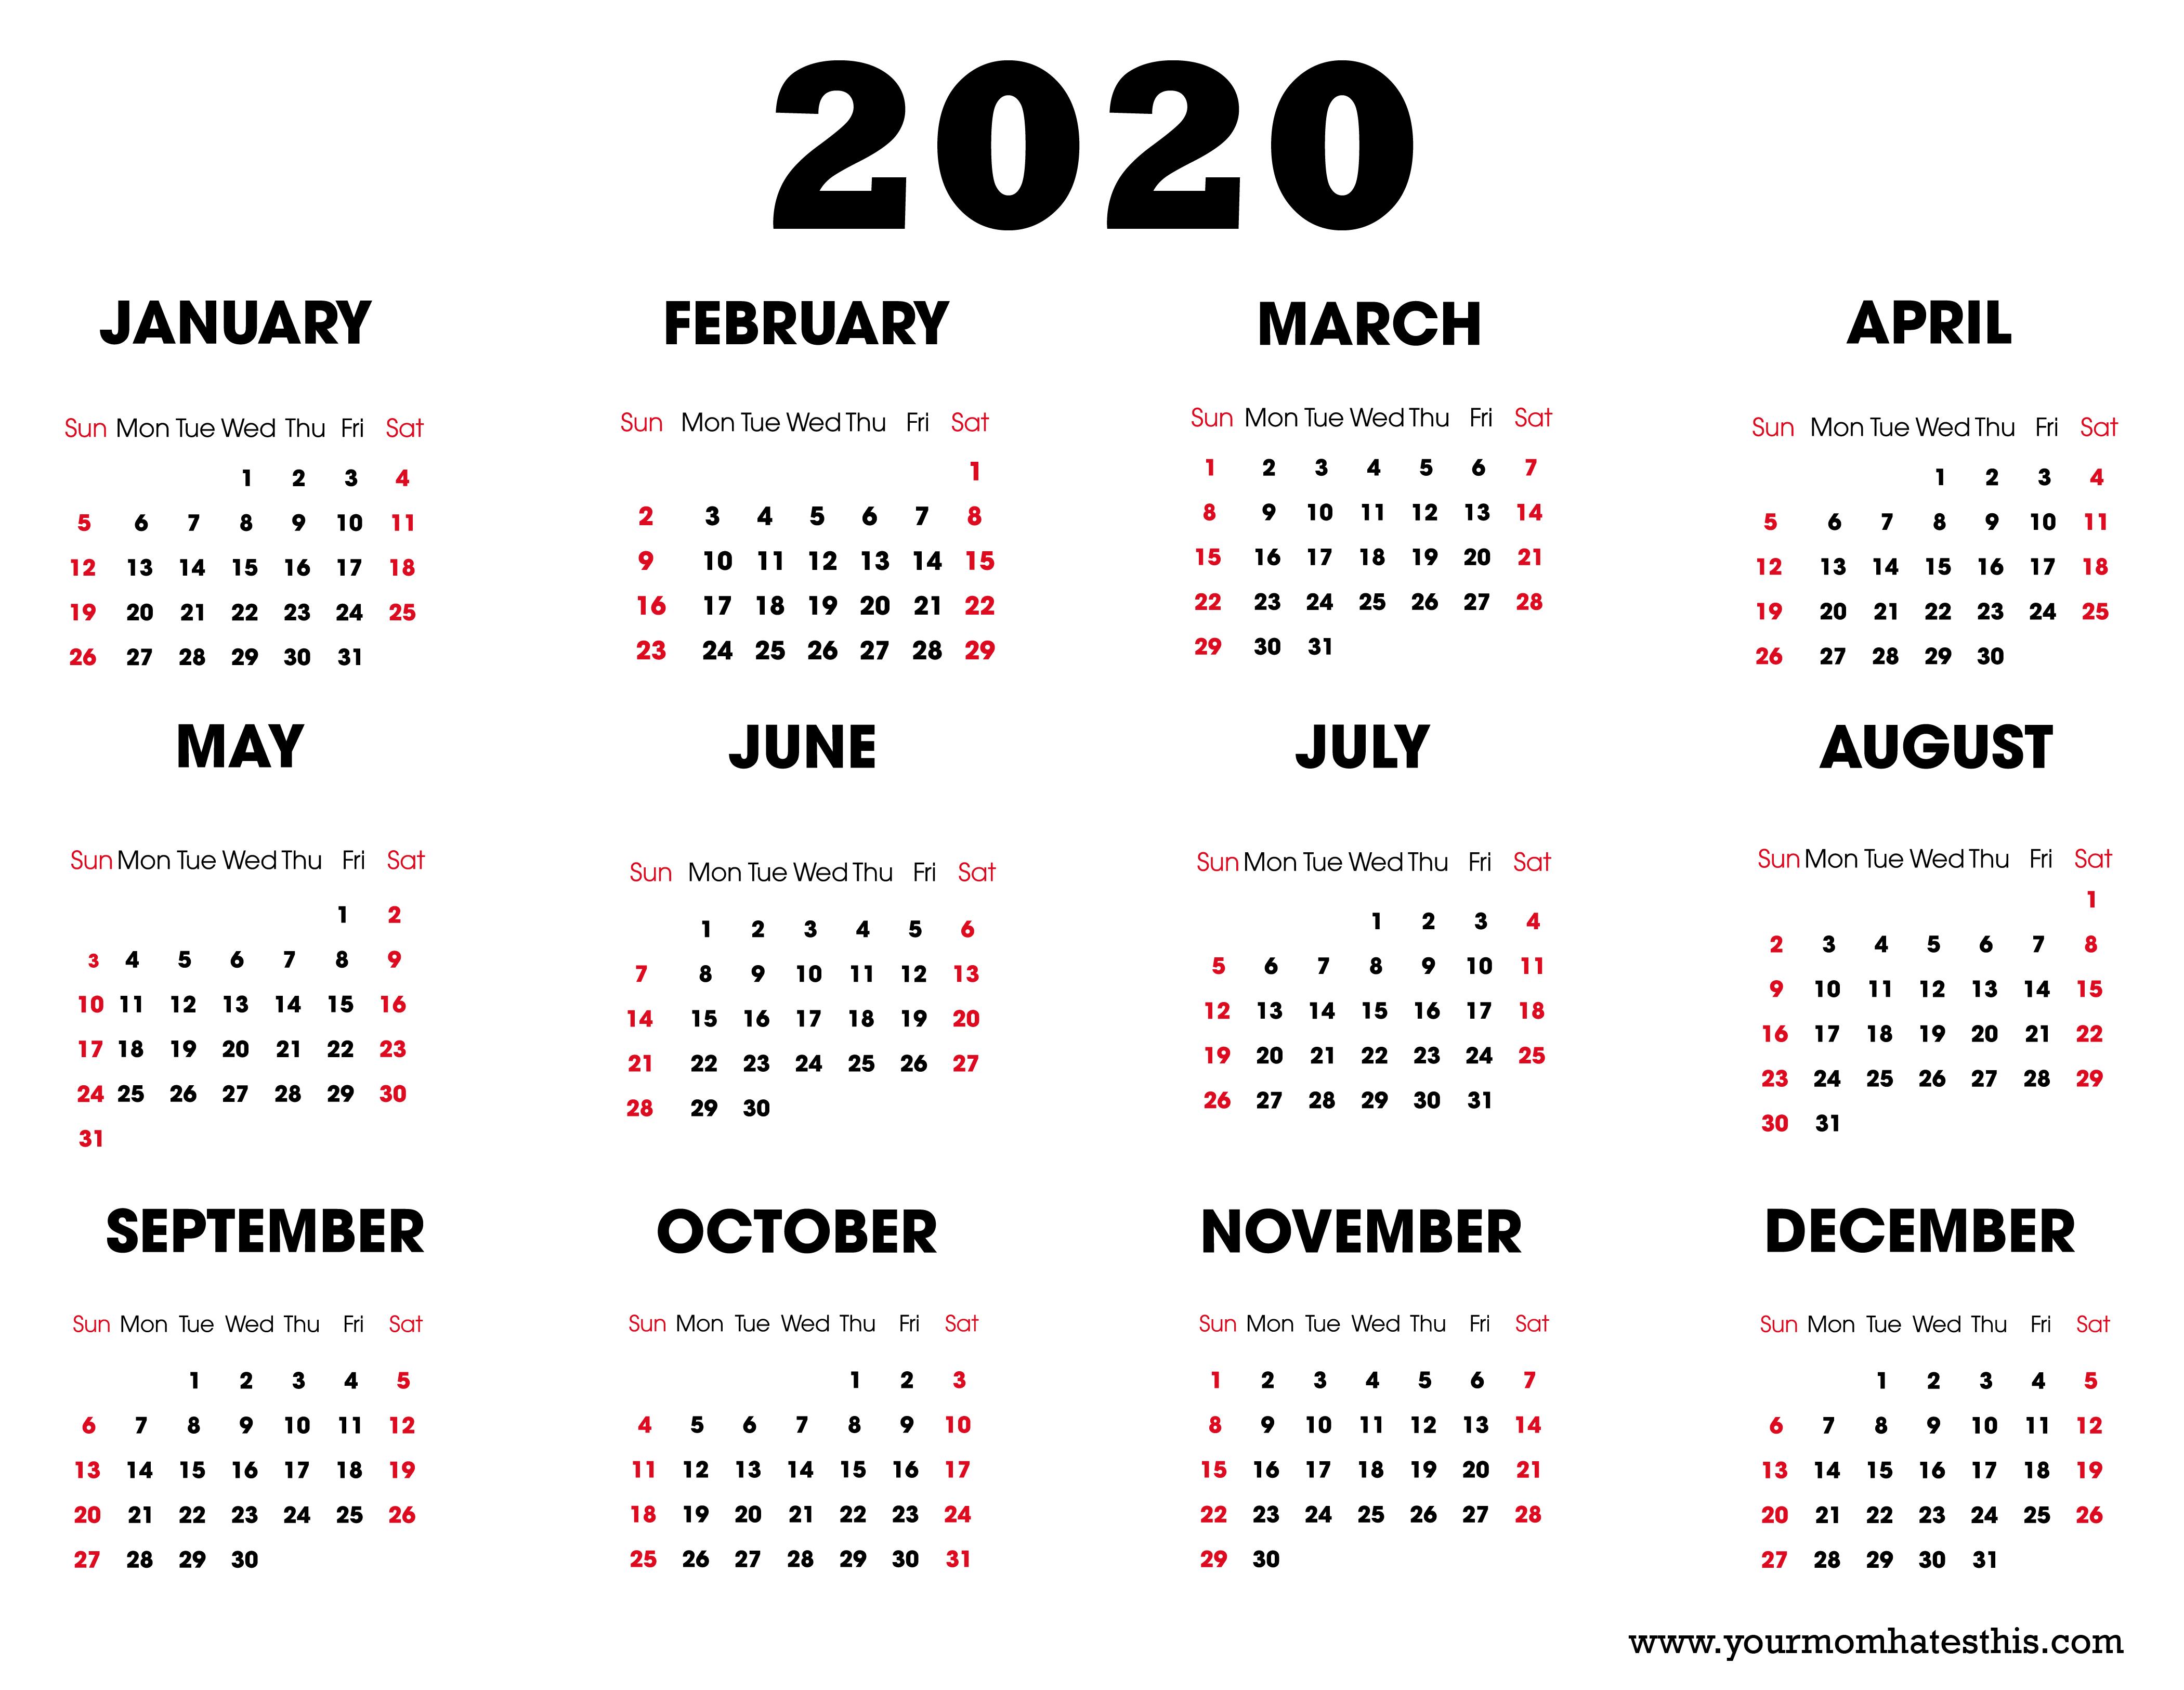 2020 Calendars In Pdf - Download Templates Of Calendar 2020 within 2020 Calendar Vertical